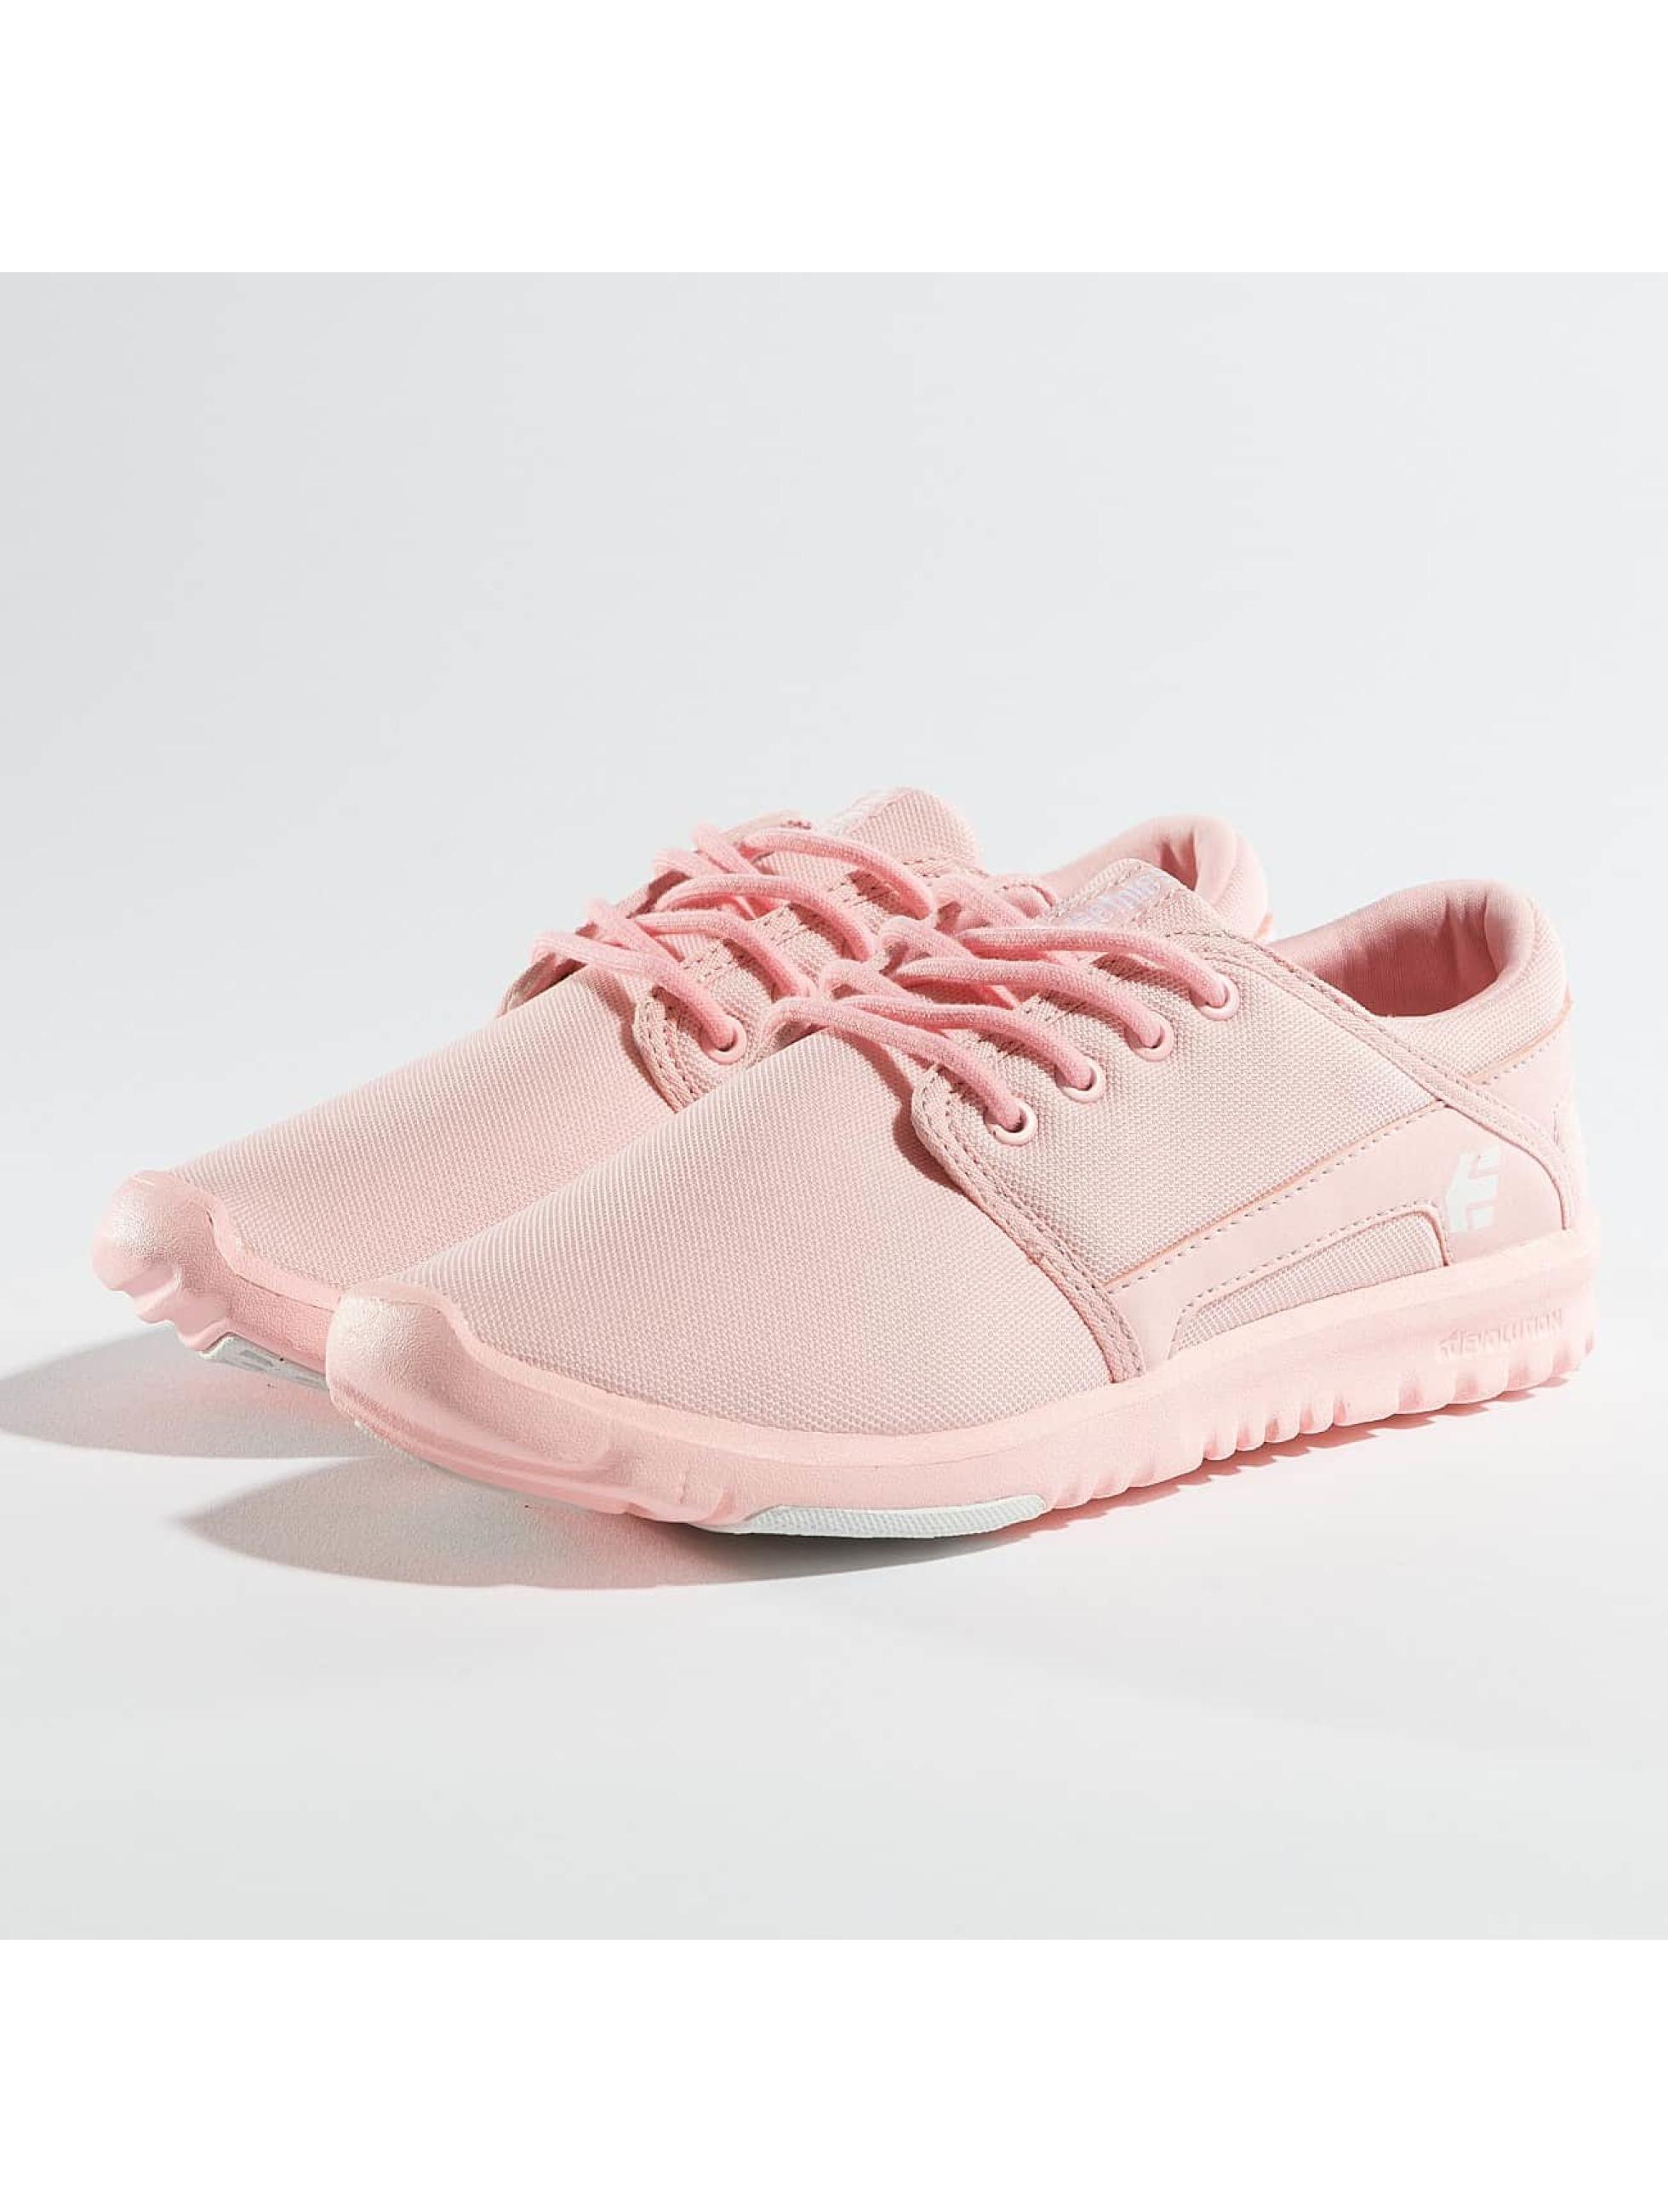 Etnies Frauen Sneaker Scout in pink